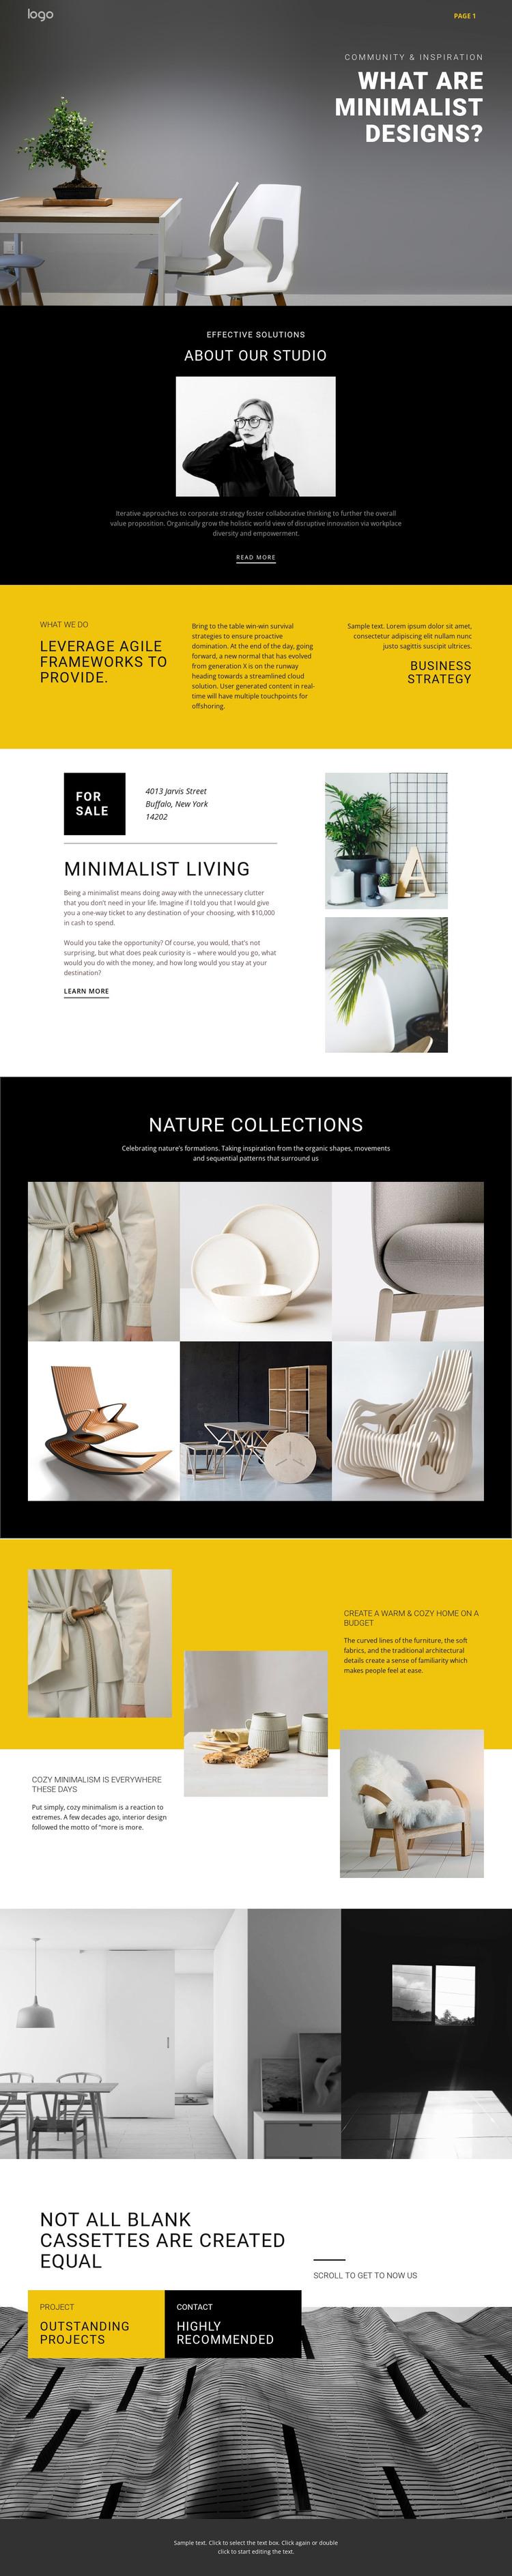 Minimalist designer interiors WordPress Theme